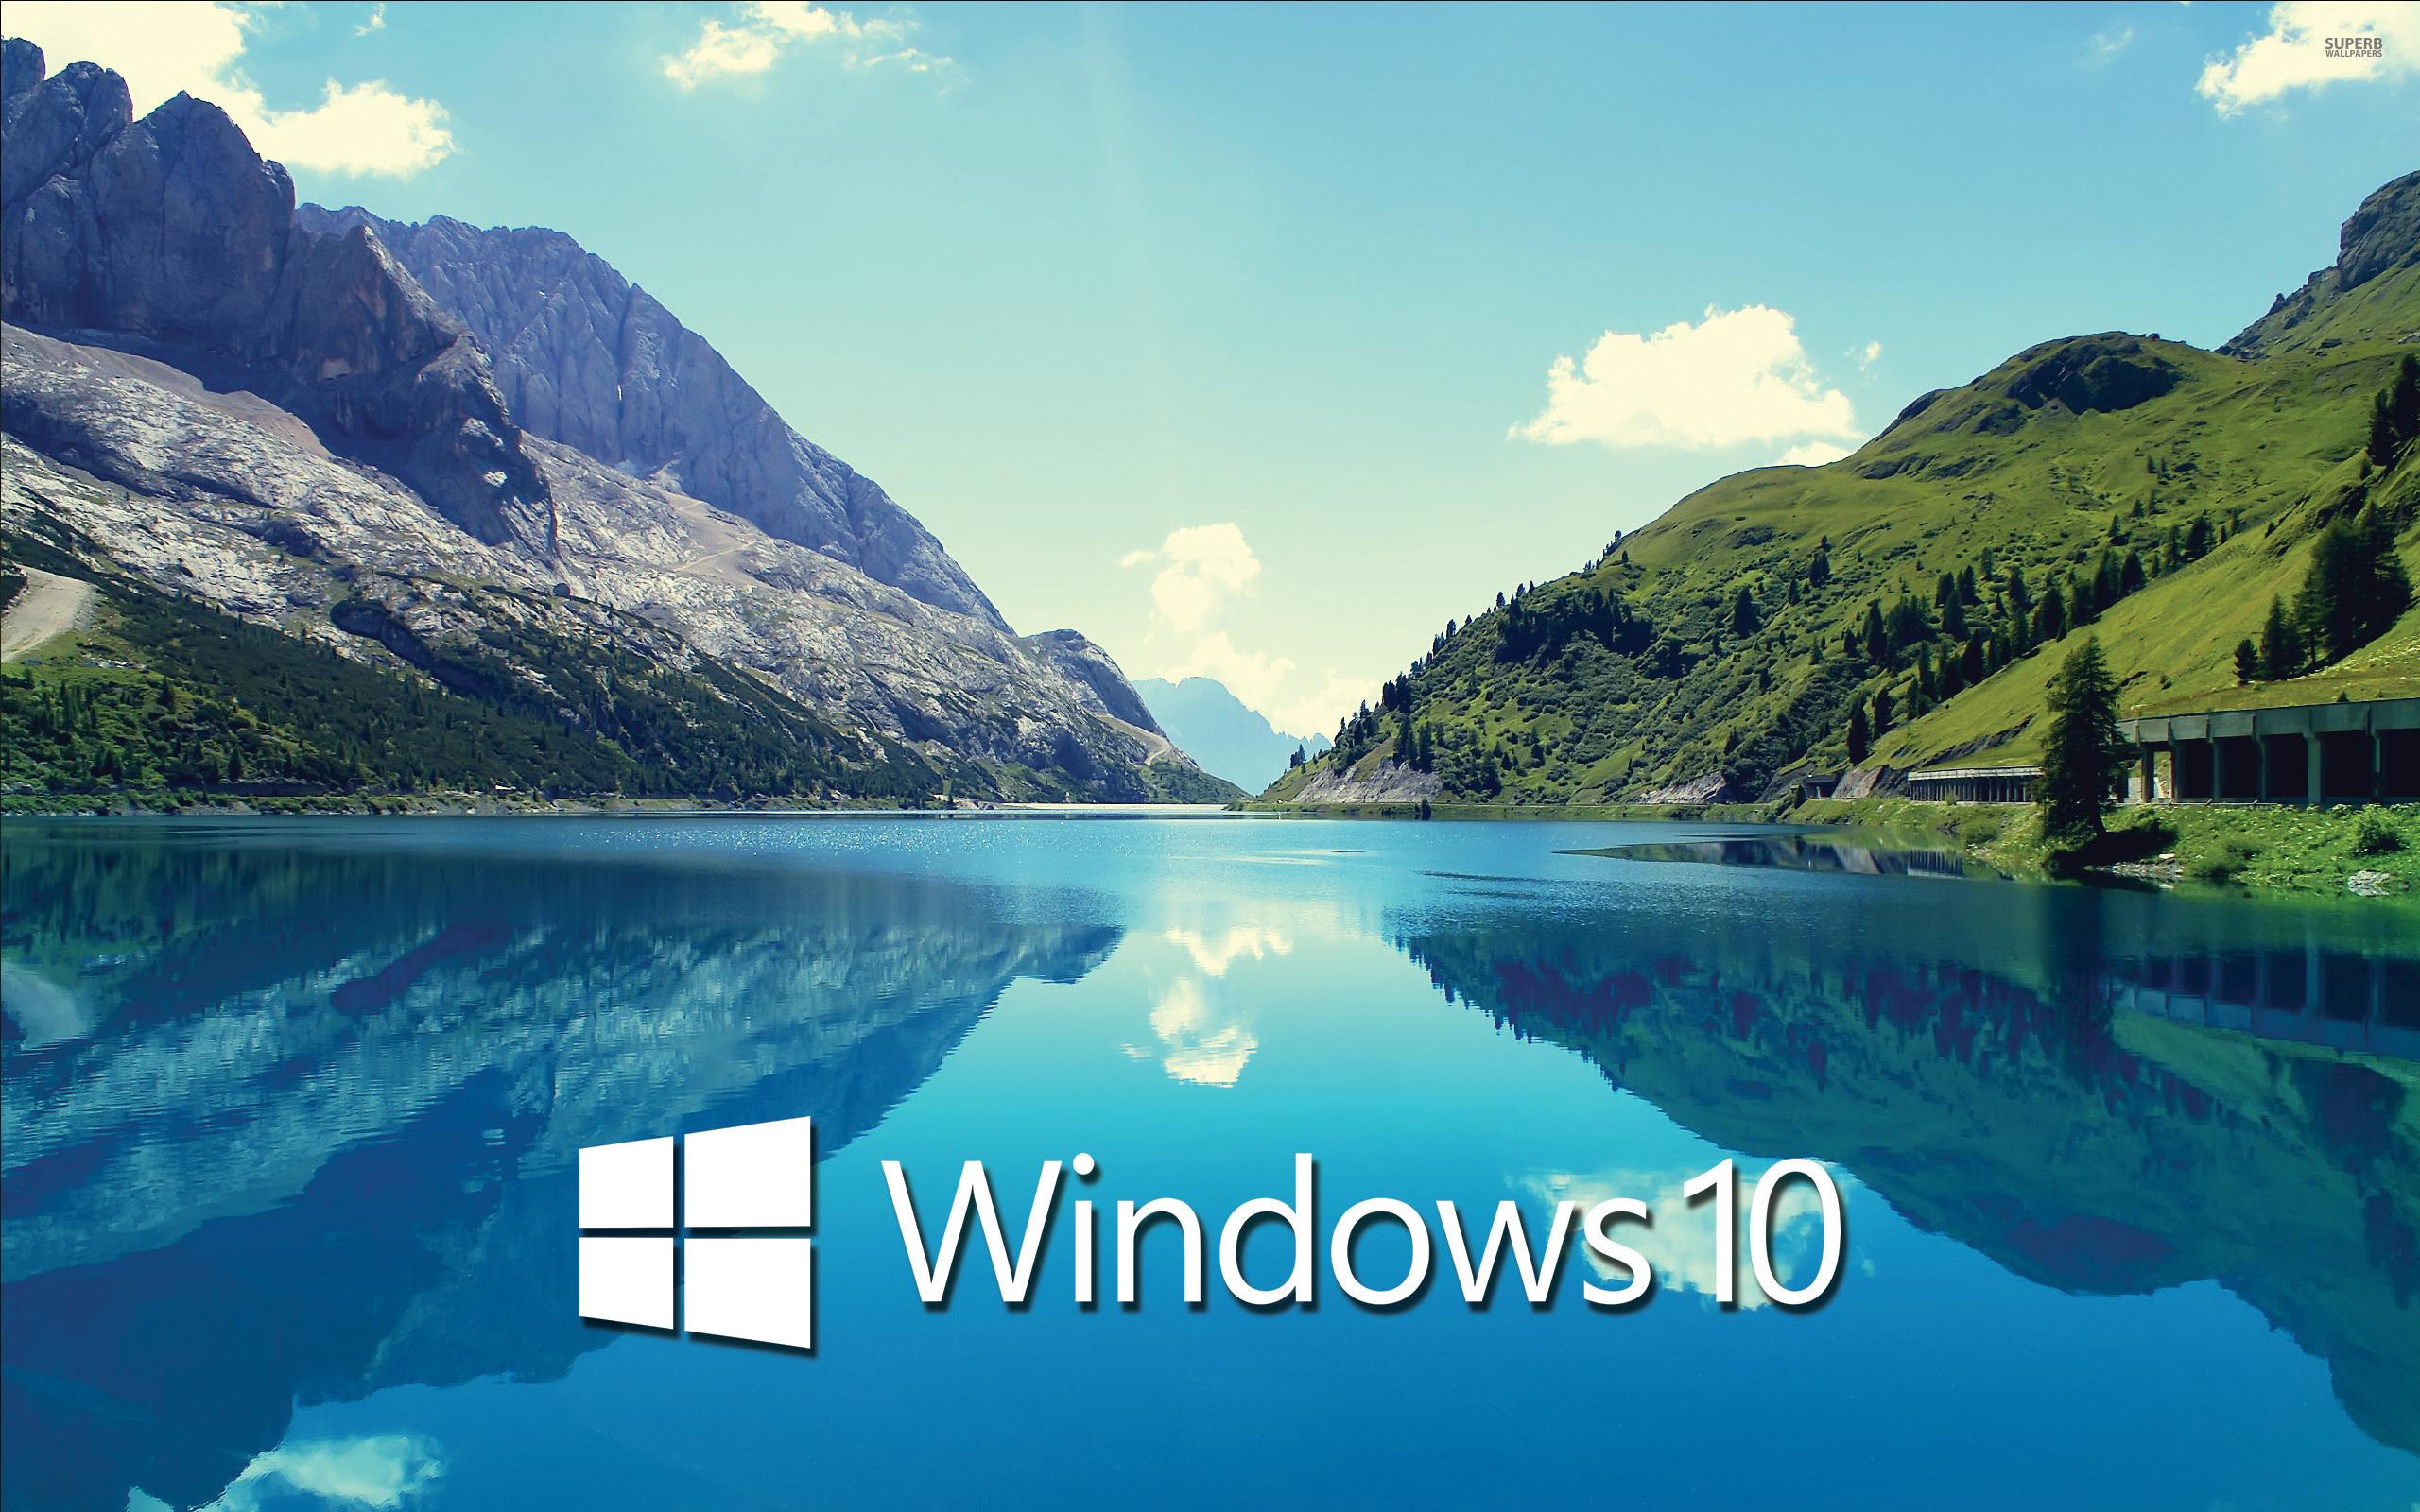 Windows 10 Original Wallpaper: Sfondi Desktop Windows 10 (77+ Immagini